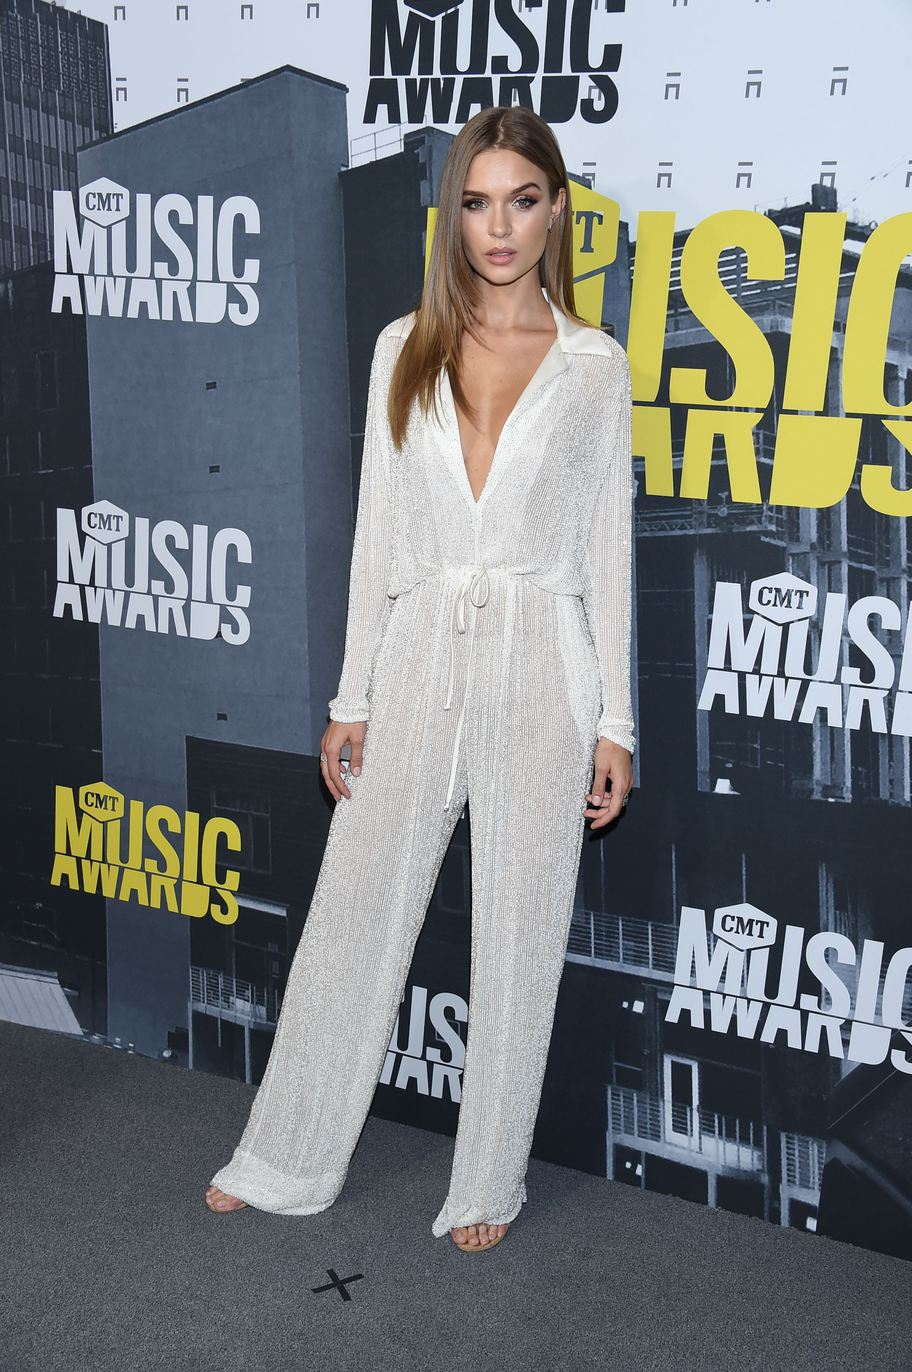 Mandatory Credit: Photo by Jim Smeal/BEI/Shutterstock (8860246ew) Josephine Skriver CMT Music Awards, Arrivals, Nashville, USA - 07 Jun 2017